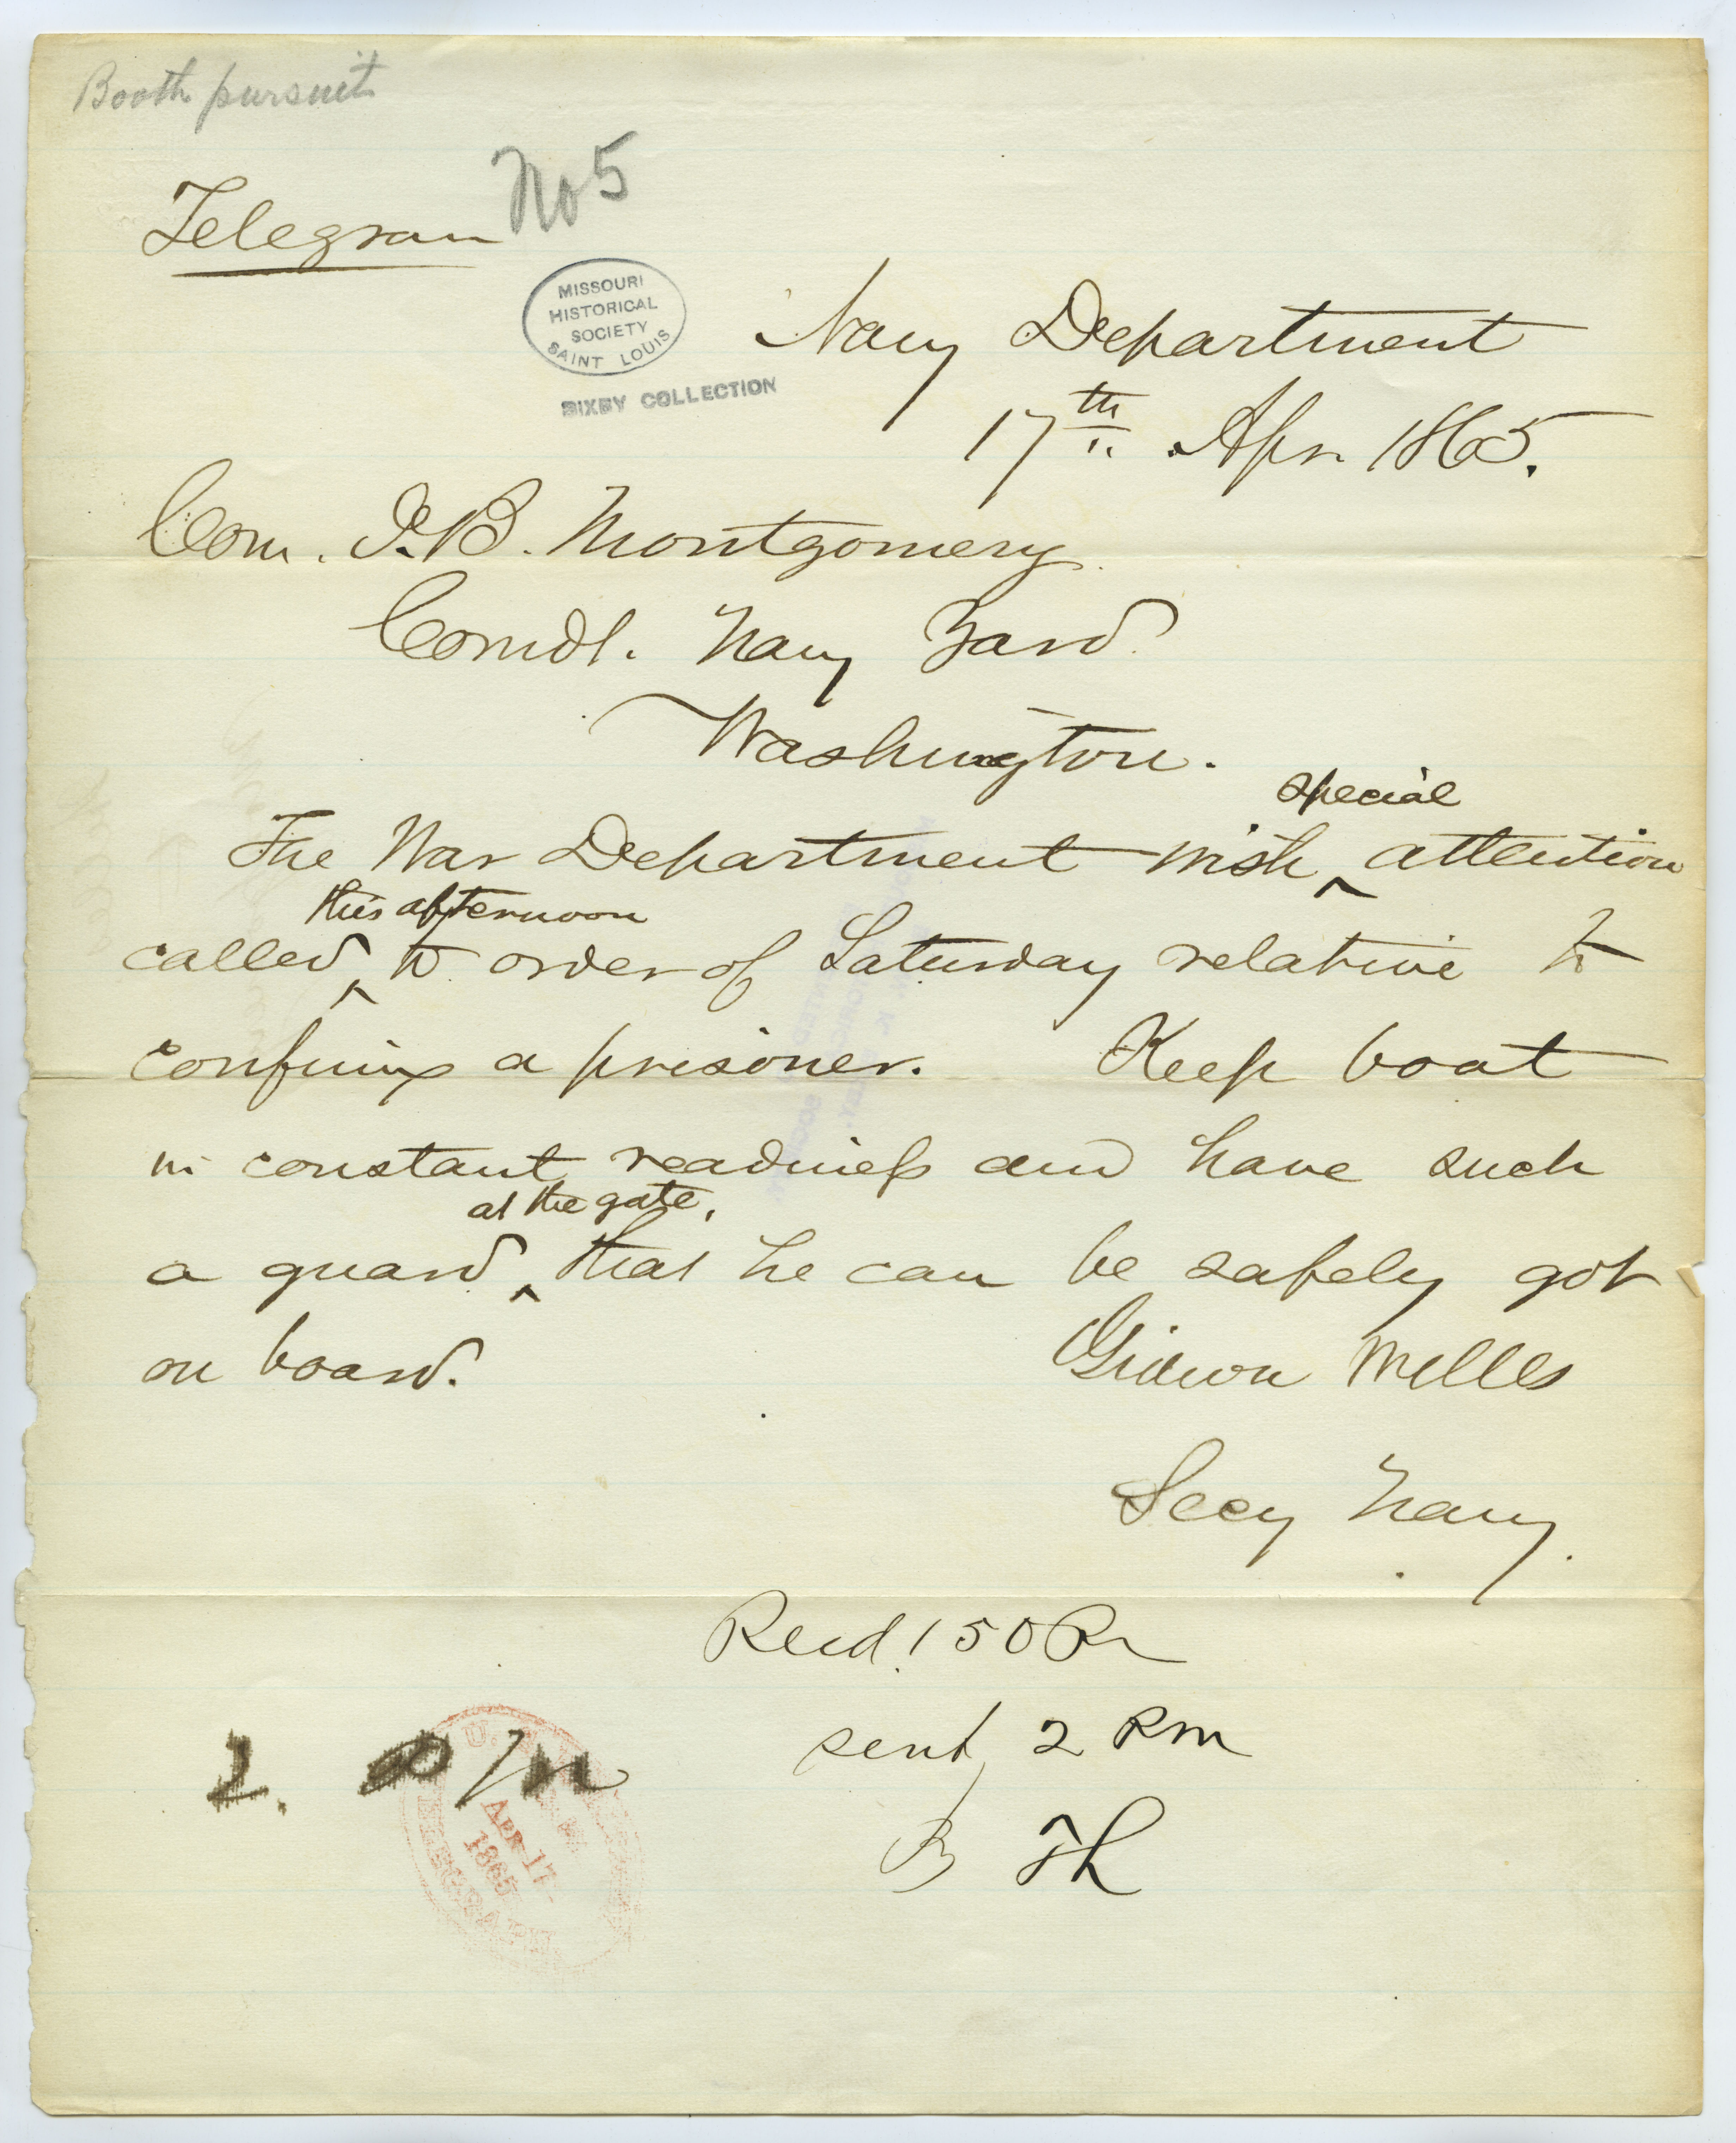 Contemporary copy of telegram of Gideon Welles, Secy. Navy, Navy Department, to Com. J.B. Montgomery, Comdg. Navy Yard, Washington, April 17, 1865